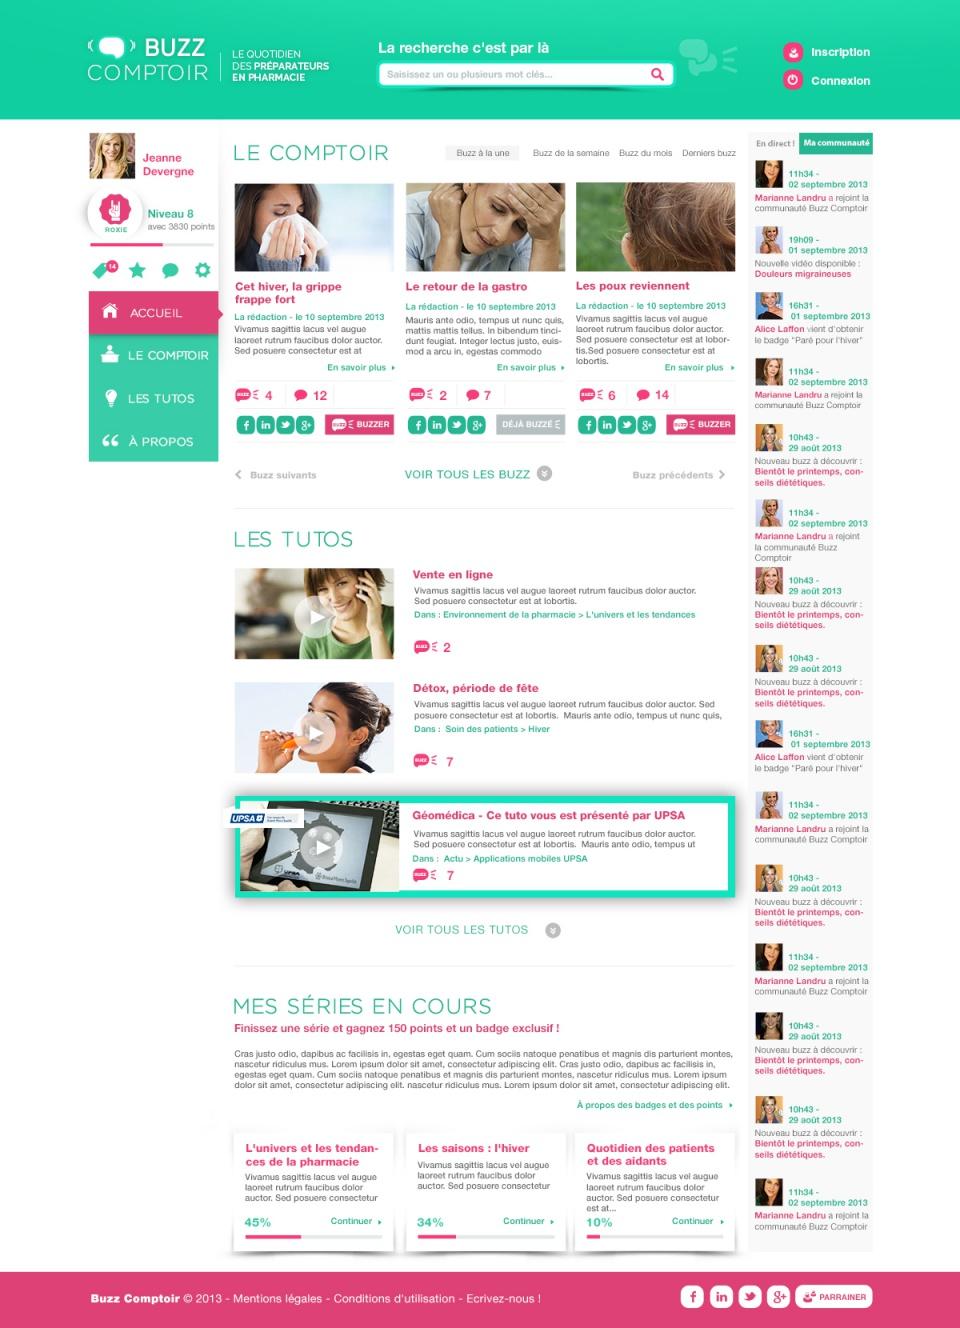 Homepage / Buzz Comptoir